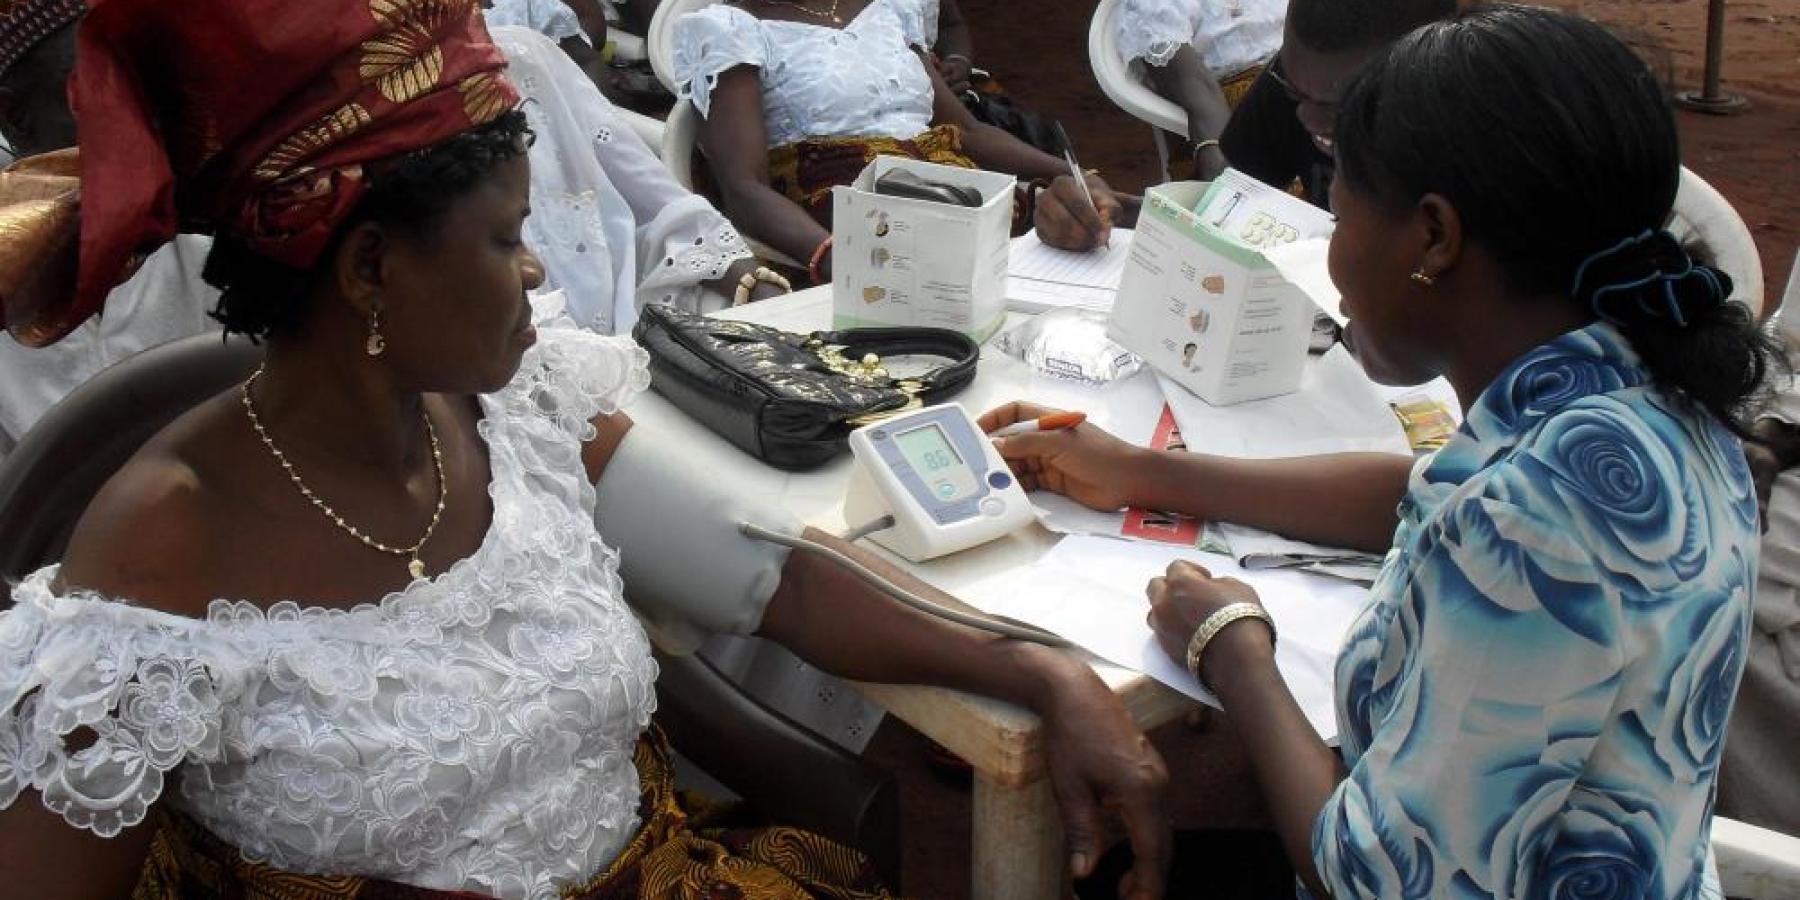 Community health workers © 2009 Vivian Ben Obiagwu_Bethel Viva Foundation, Courtesy of Photoshare